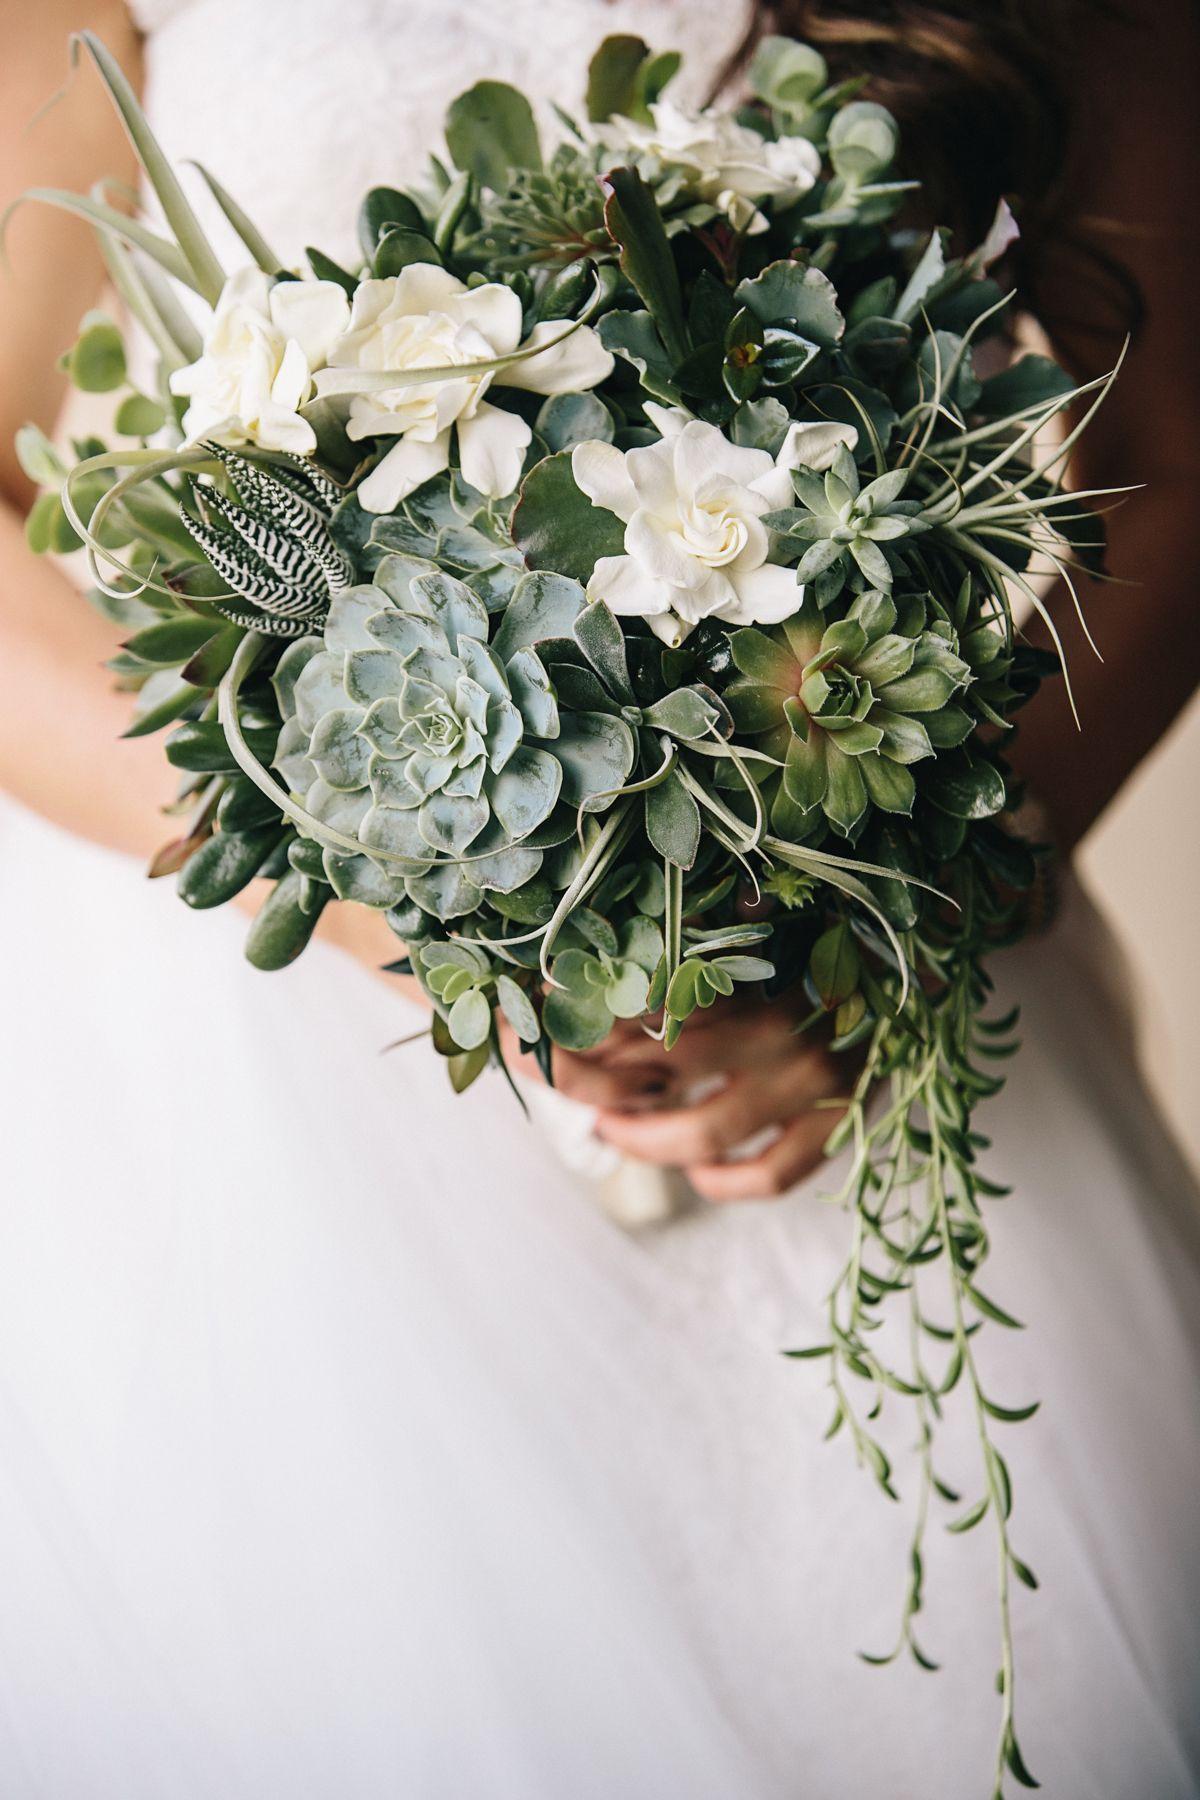 8 Awe Inspiring Bouquets Featuring Cascading Blossoms Succulent Bouquet Wedding Succulent Bridal Bouquets Cascading Bridal Bouquets